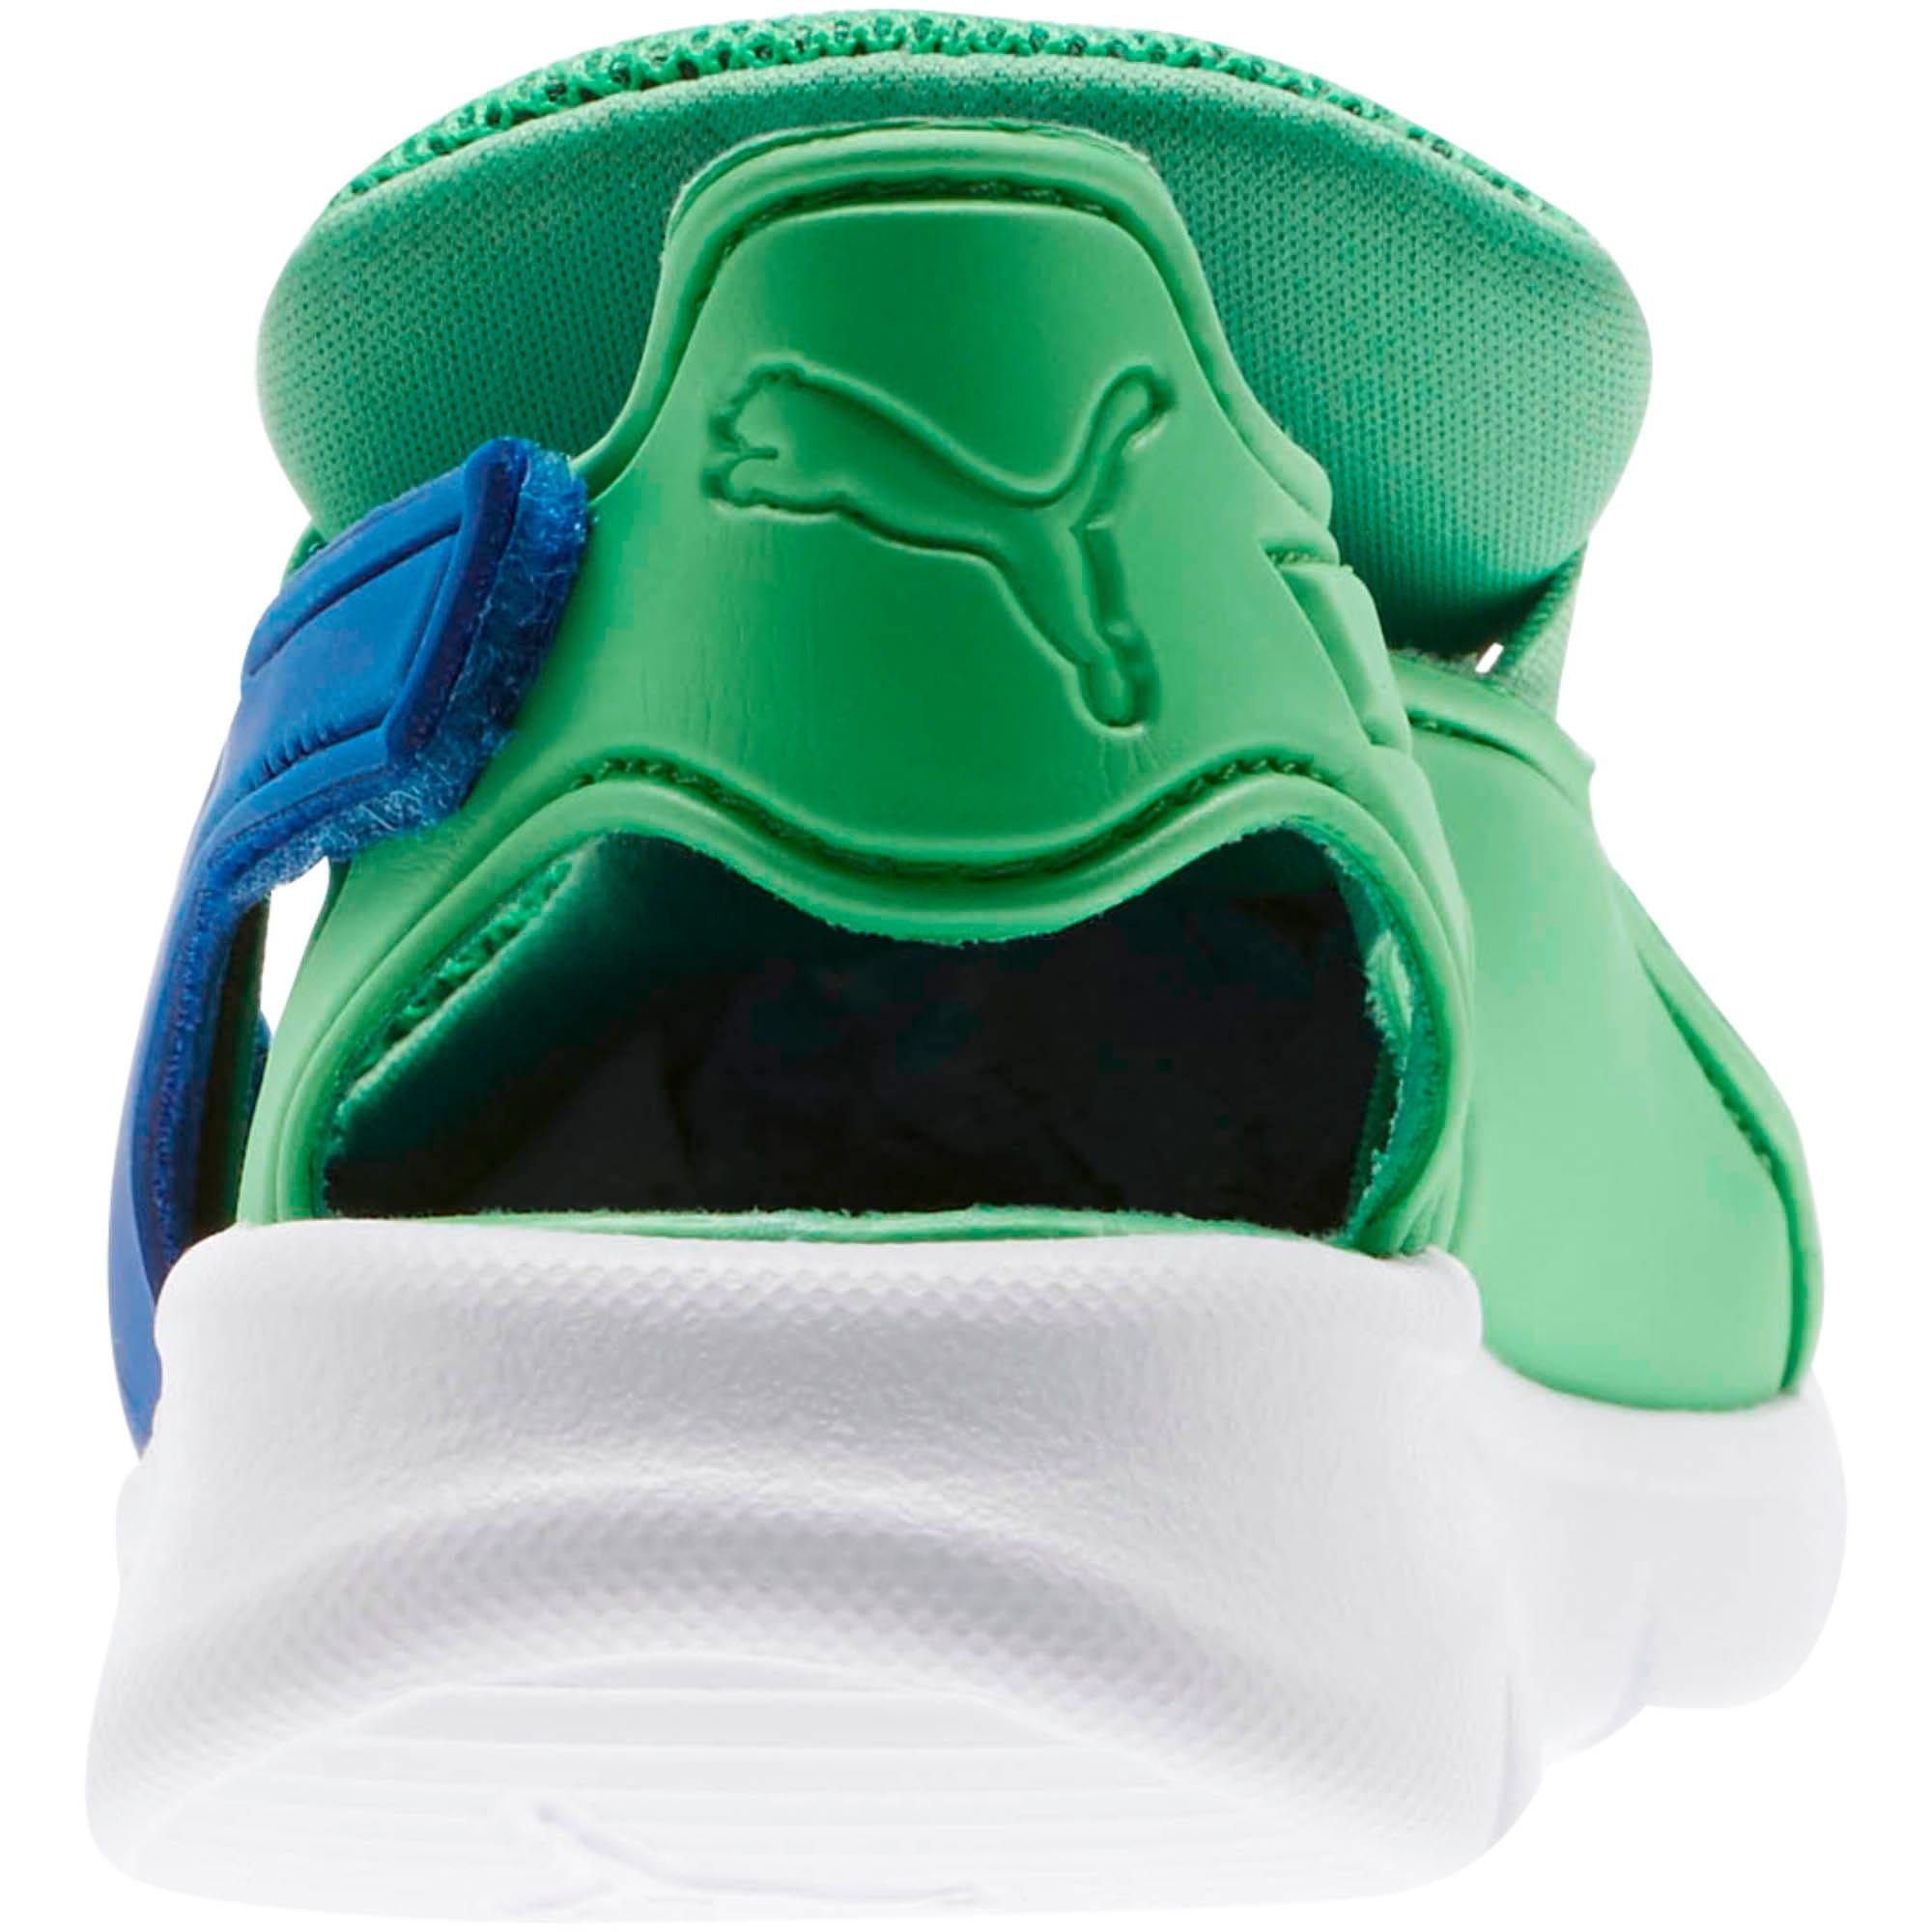 Thumbnail 4 of Bao 3 Open Little Kids' Shoes, Surf The Web-Irish Green, medium